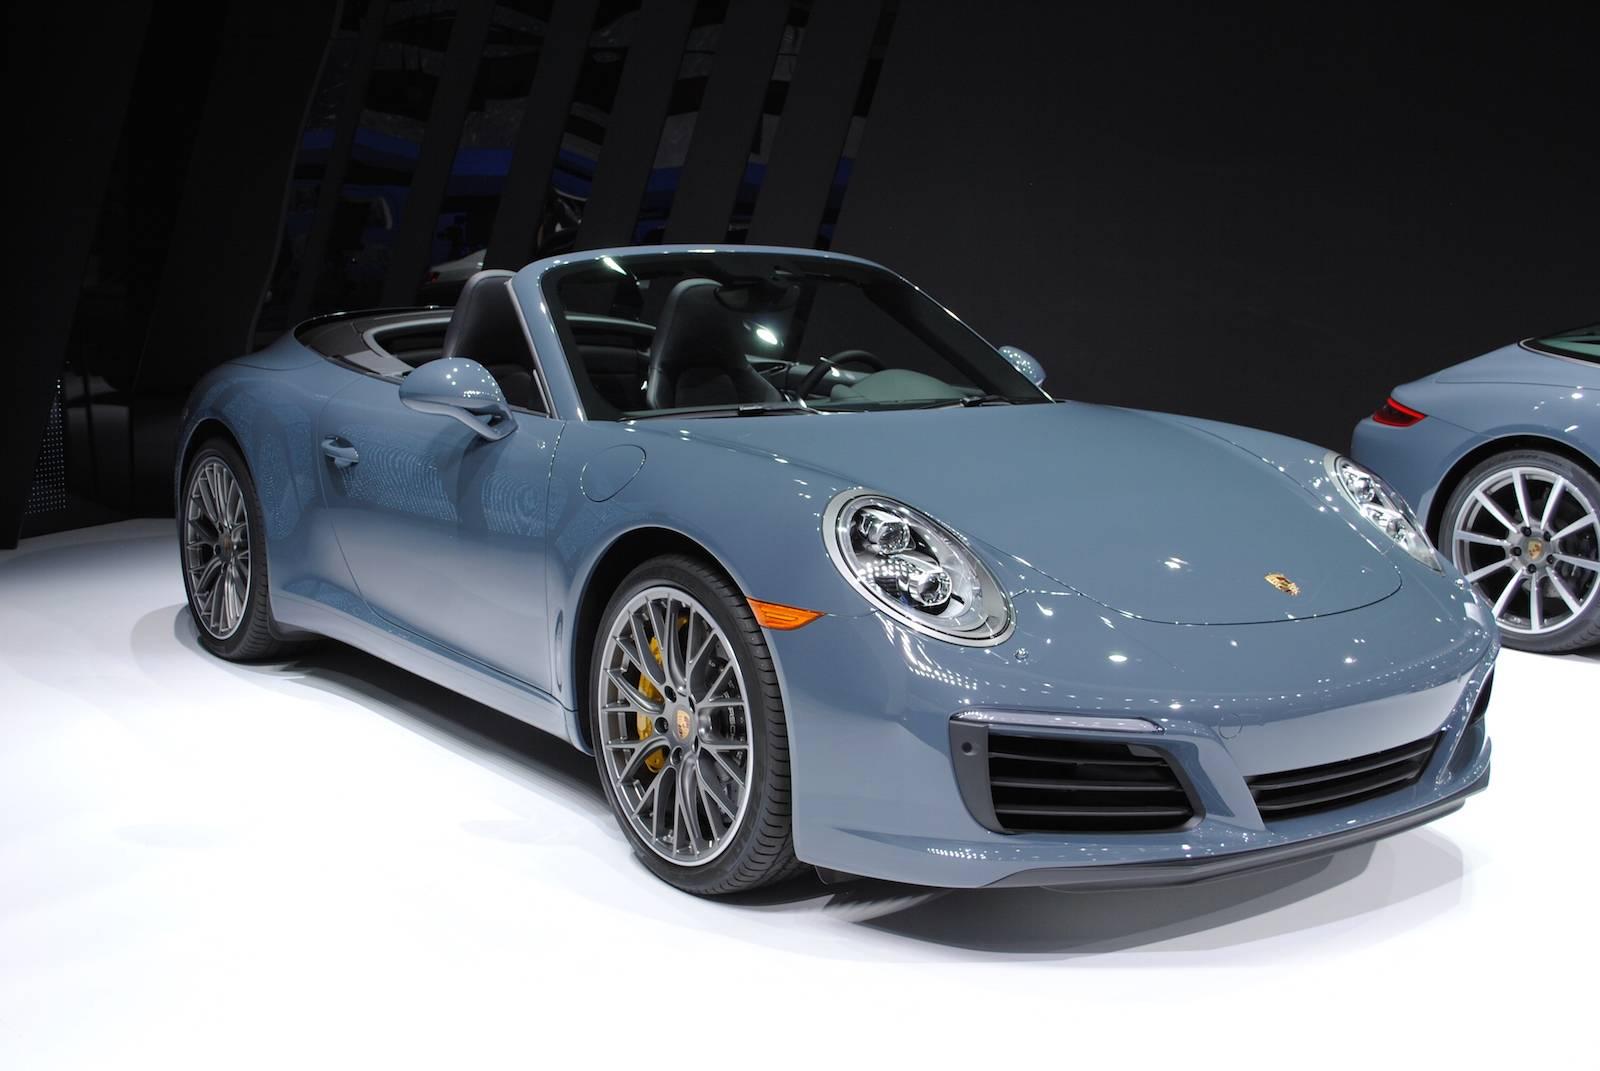 2016 detroit motor show porsche 911 carrera s cabriolet. Black Bedroom Furniture Sets. Home Design Ideas